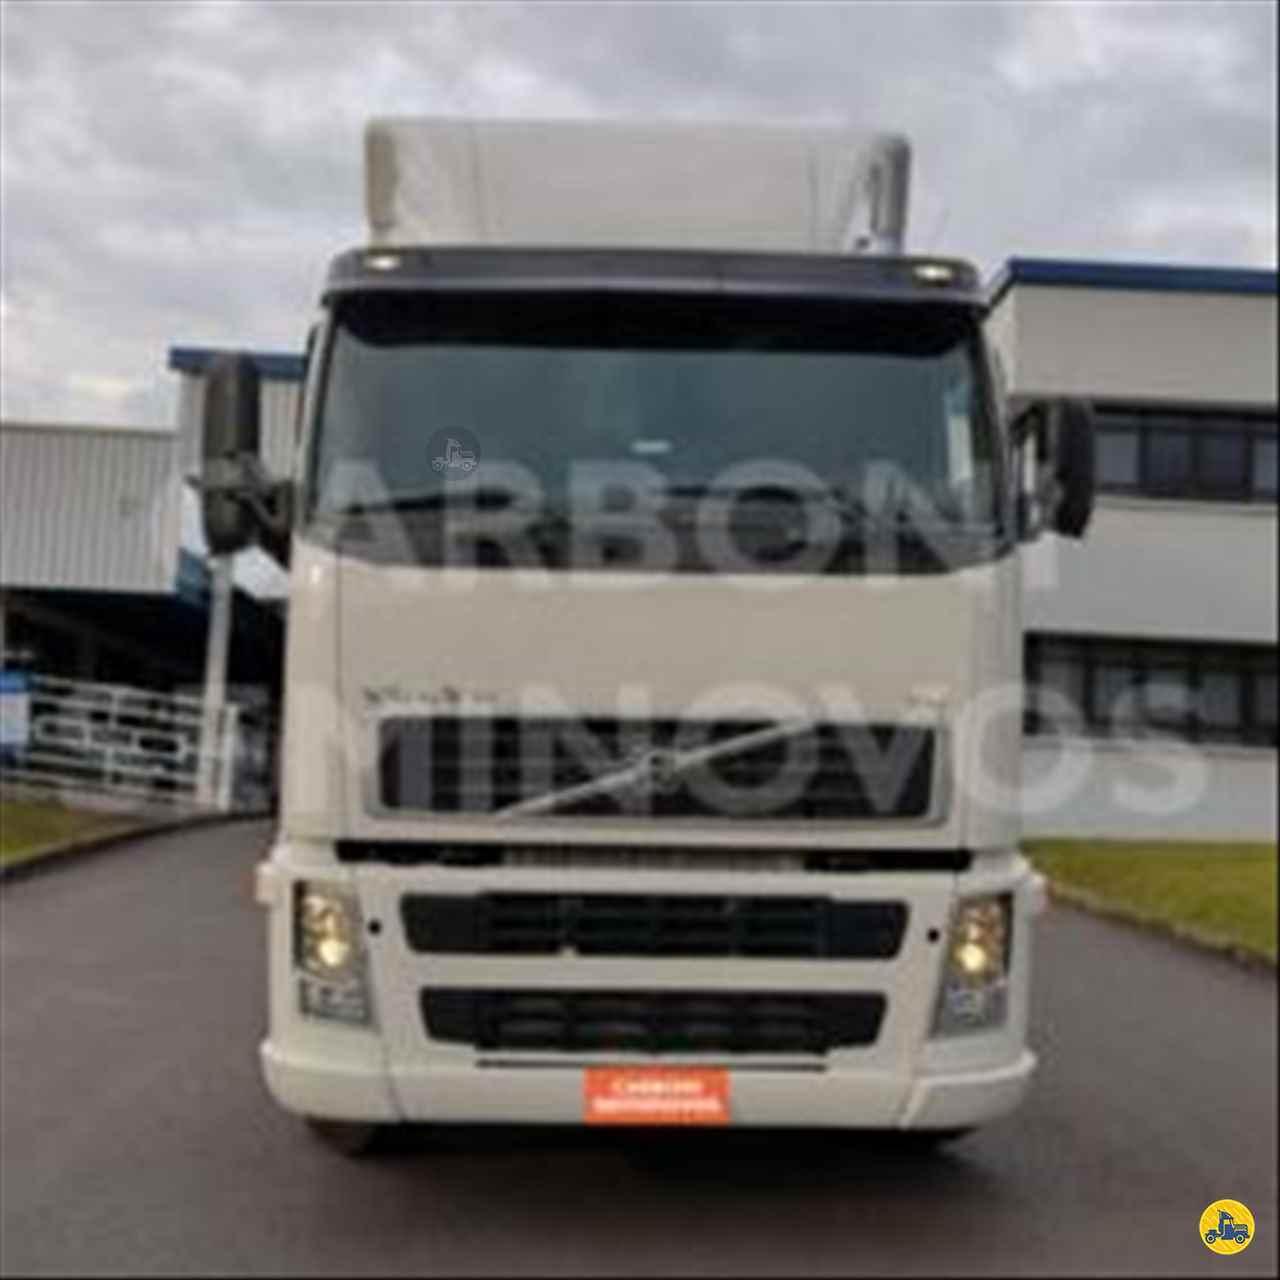 CAMINHAO VOLVO VOLVO FH 440 Cavalo Mecânico Truck 6x2 Carboni Iveco VIDEIRA SANTA CATARINA SC